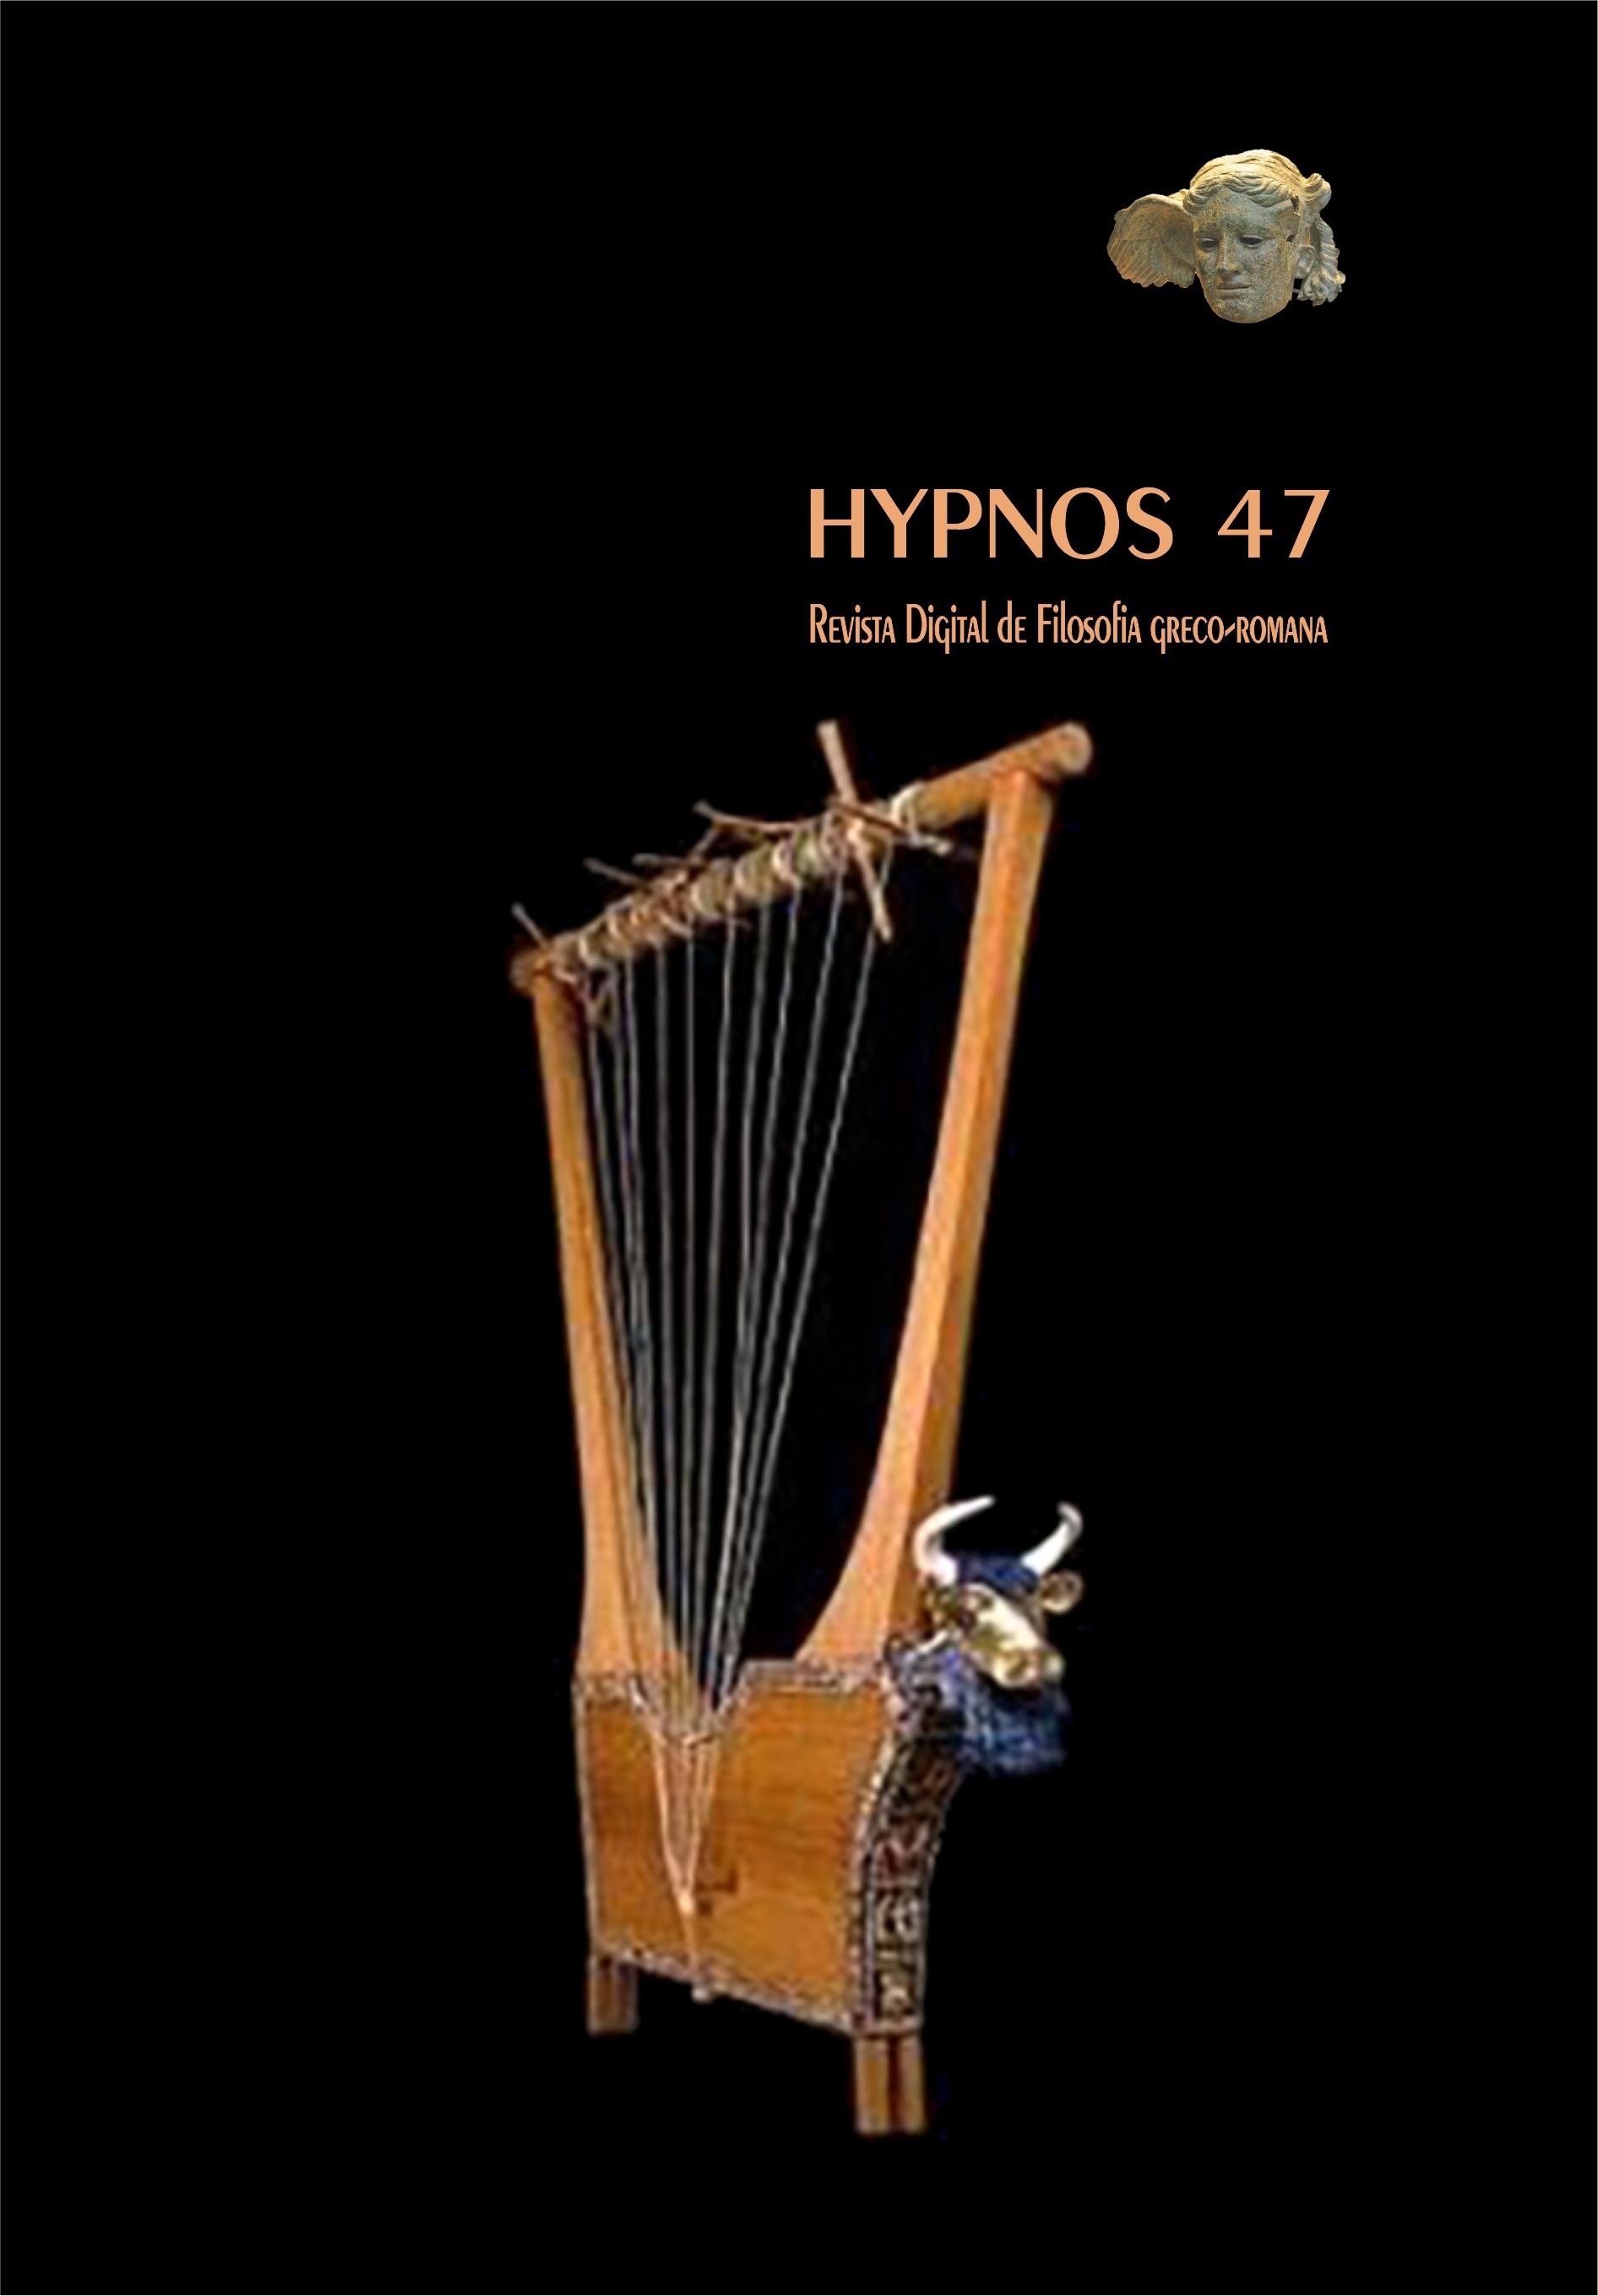 Capa Hypnos 47 - Imagem: lira grega antiga